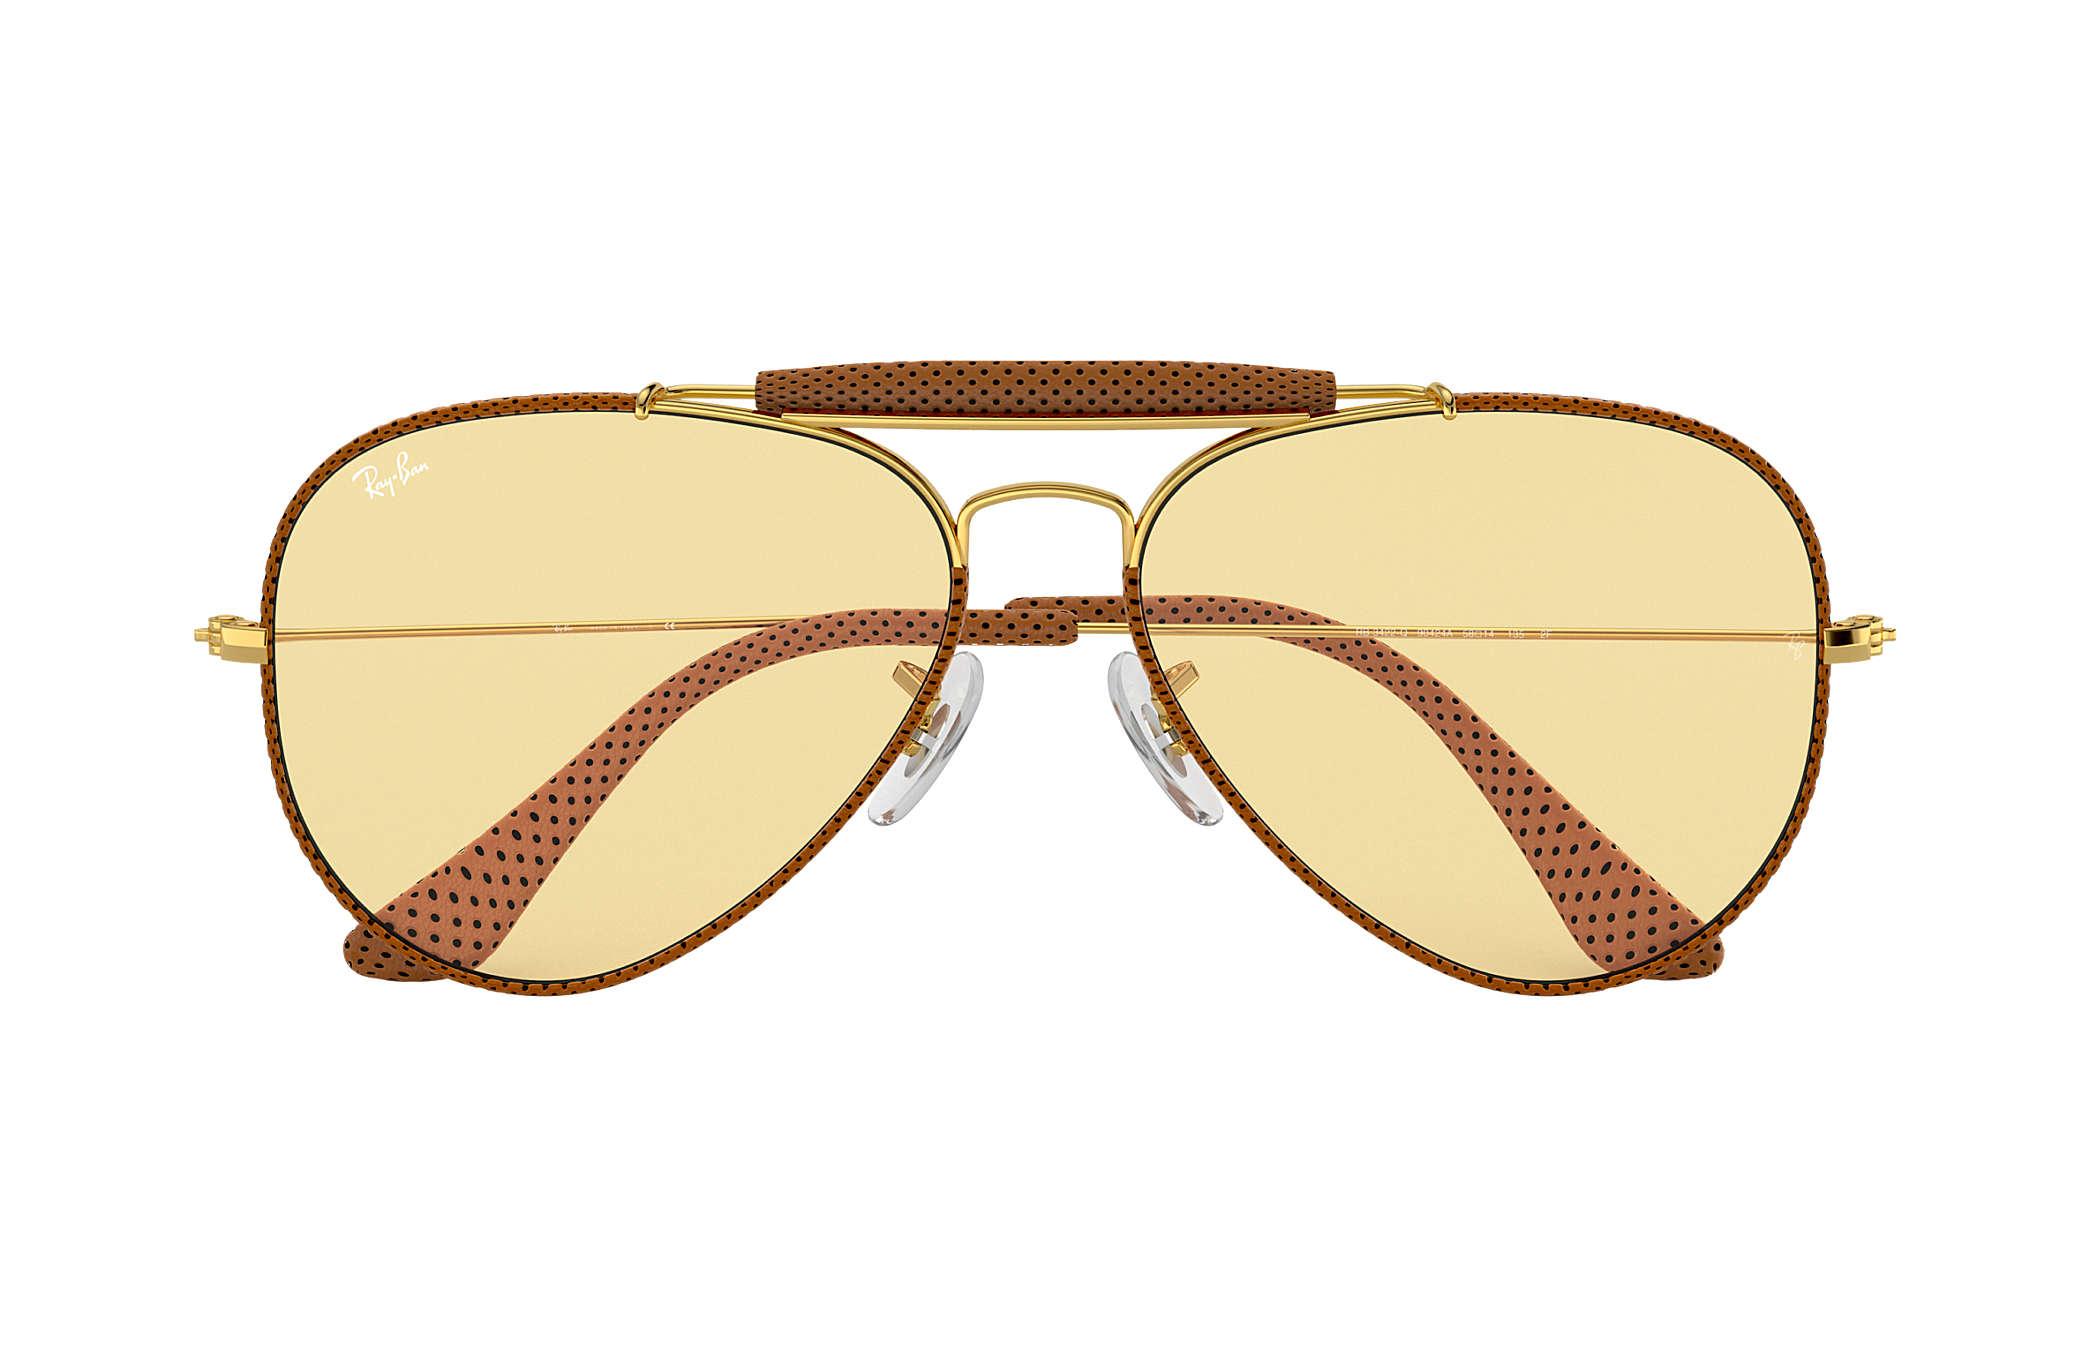 Ray-Ban Outdoorsman Craft Braun Gold, RB3422Q | Ray-Ban® Deutschland